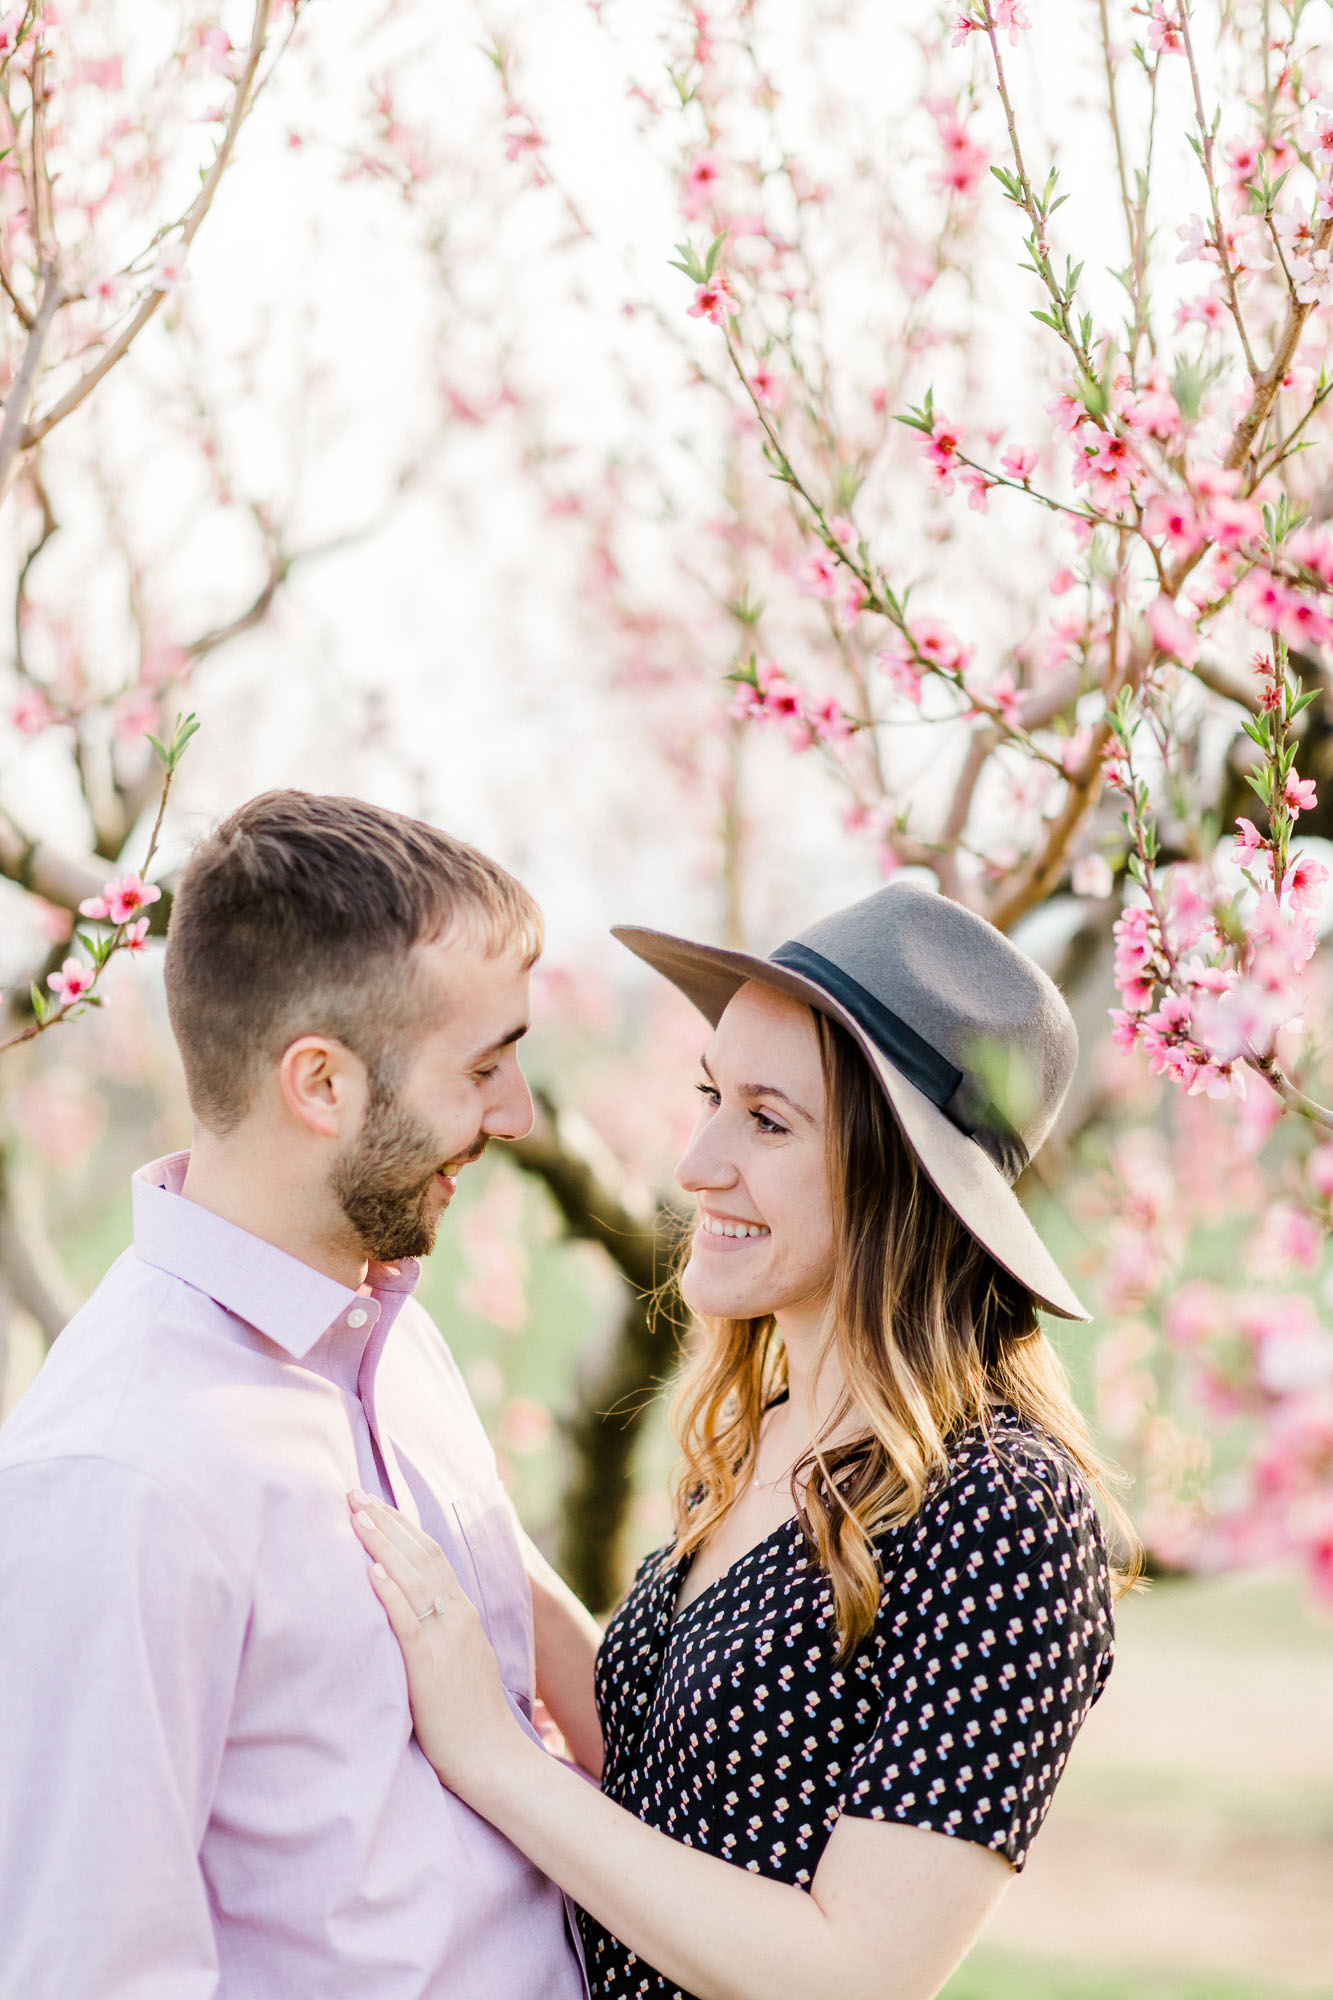 Rohrbachs-Spring-cherry-blossom-engagement-7488.jpg